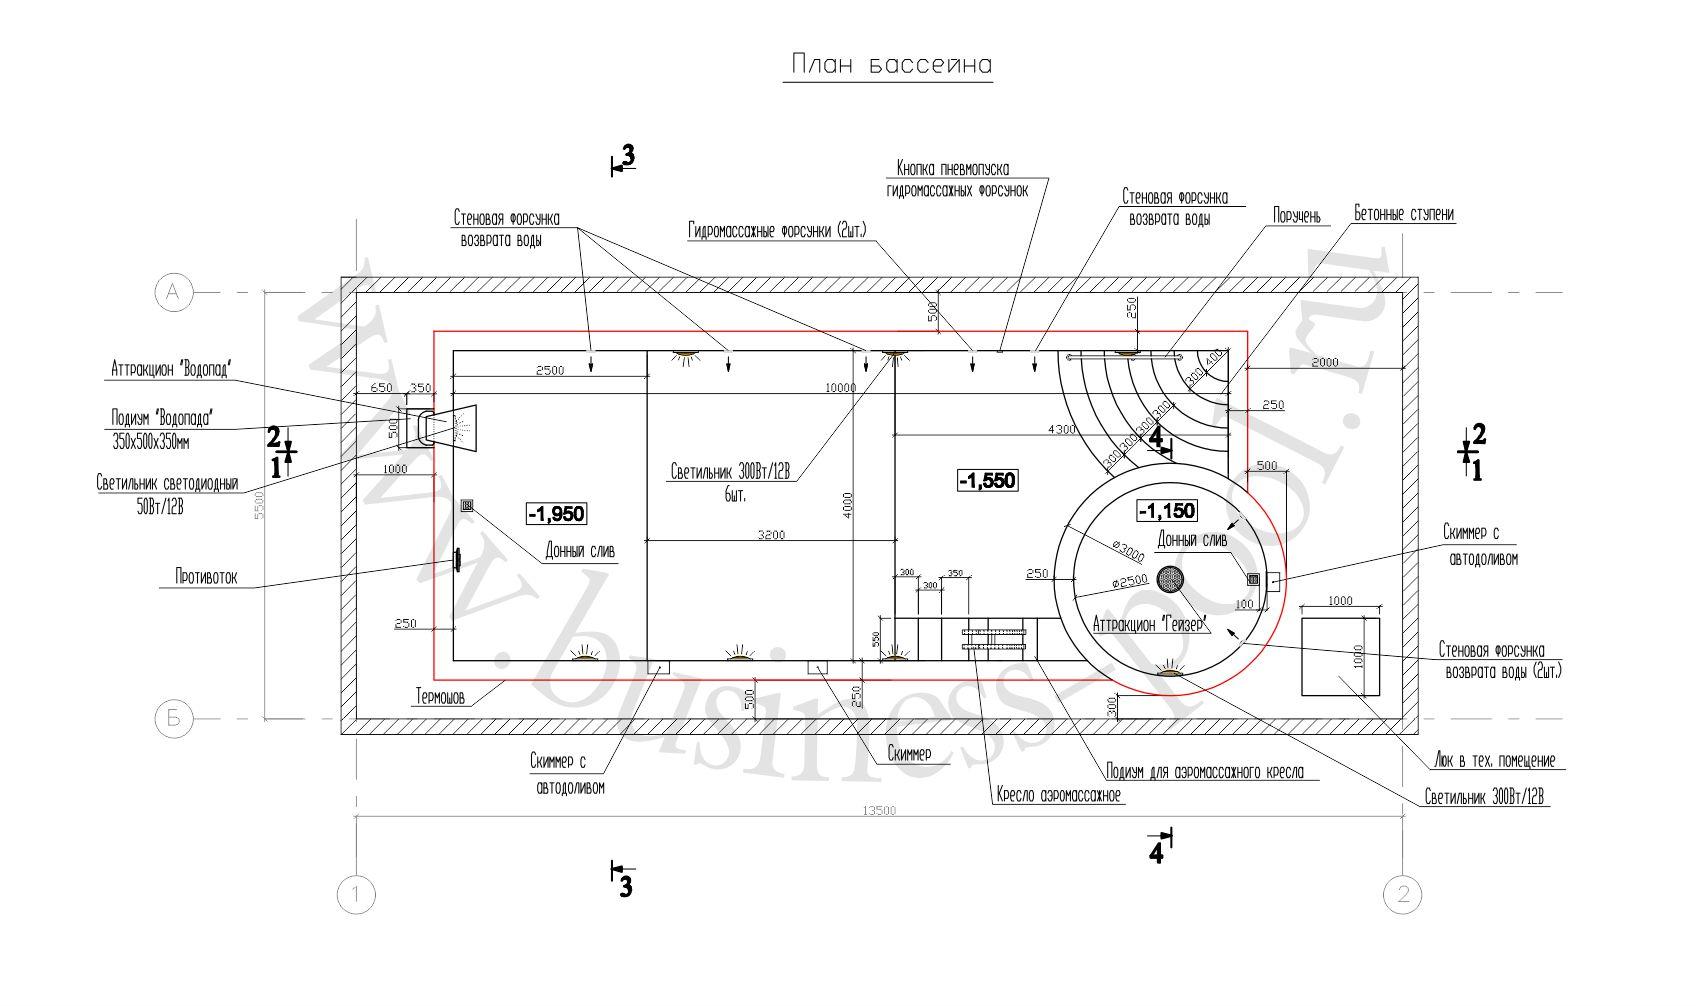 Планировка проекта тз-0035-с